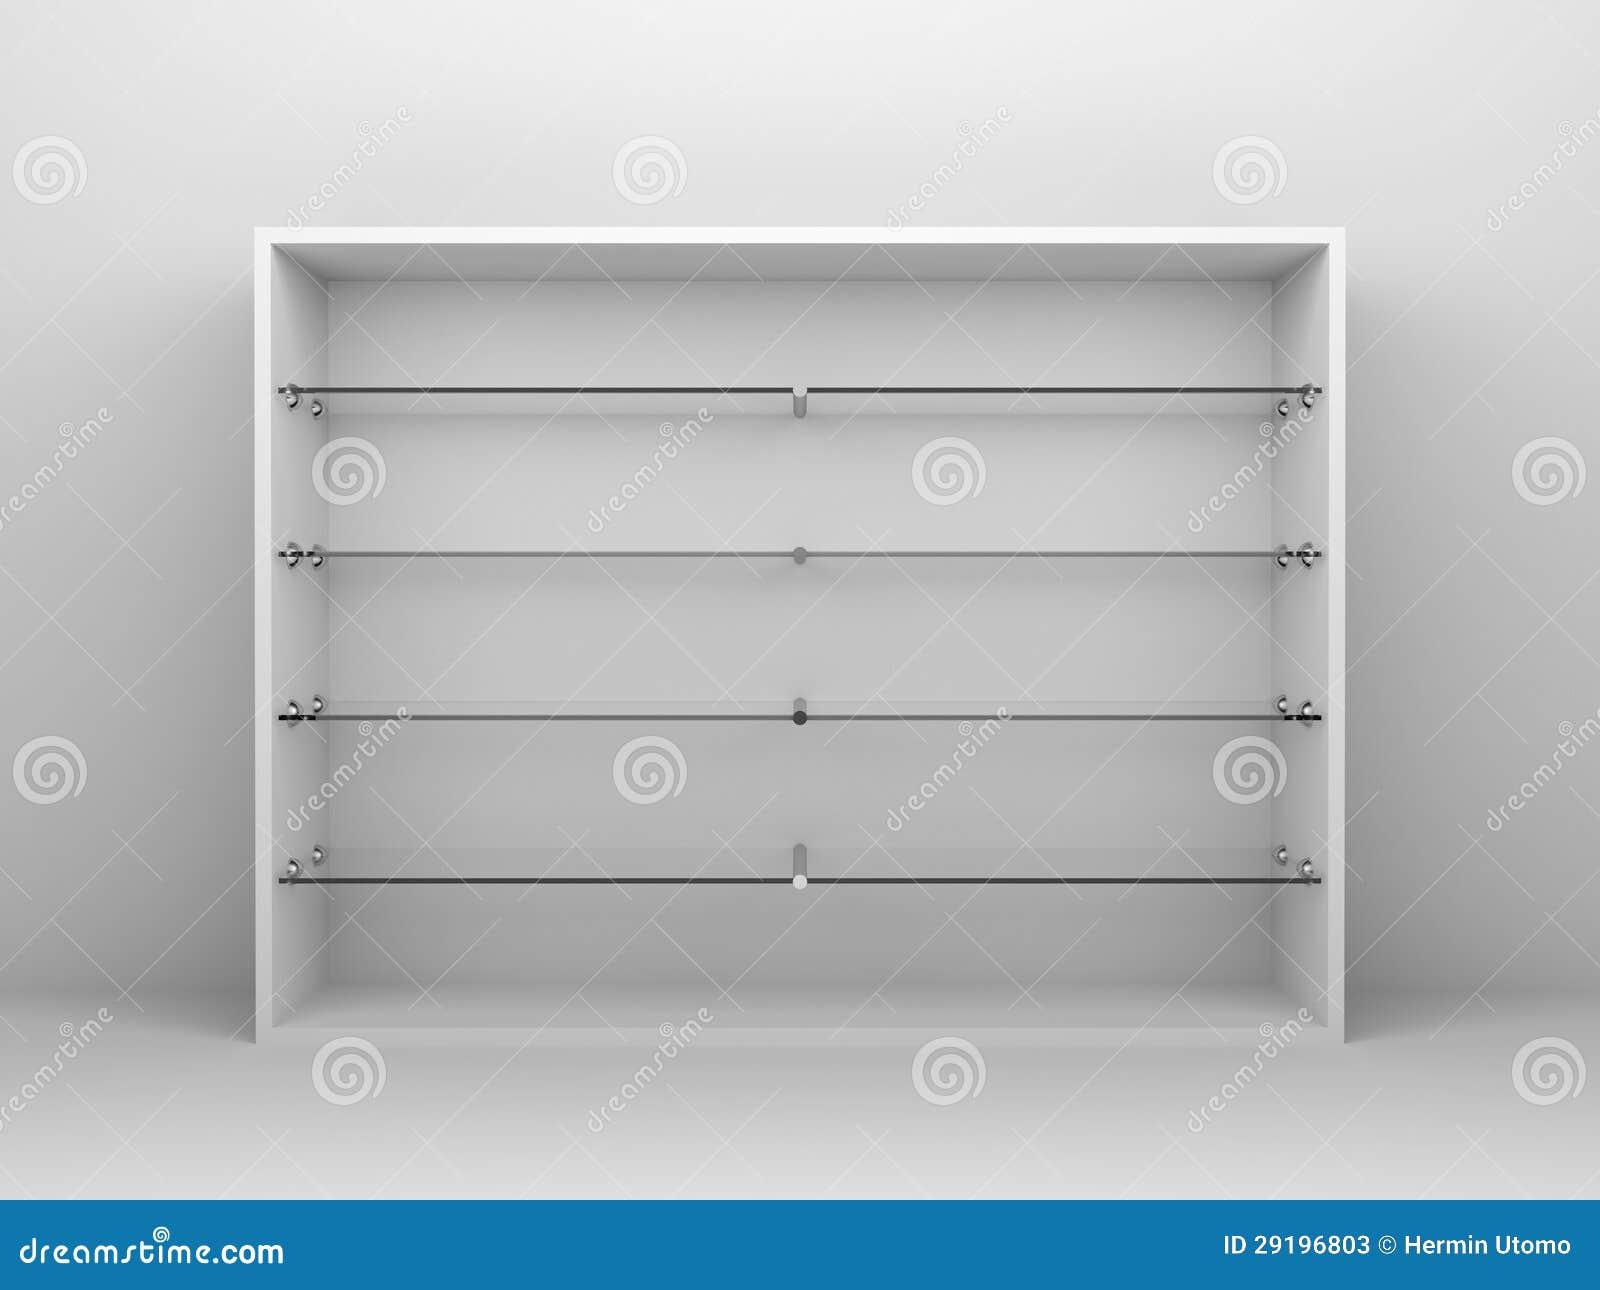 fond d 39 tag re de placard photos stock image 29196803. Black Bedroom Furniture Sets. Home Design Ideas